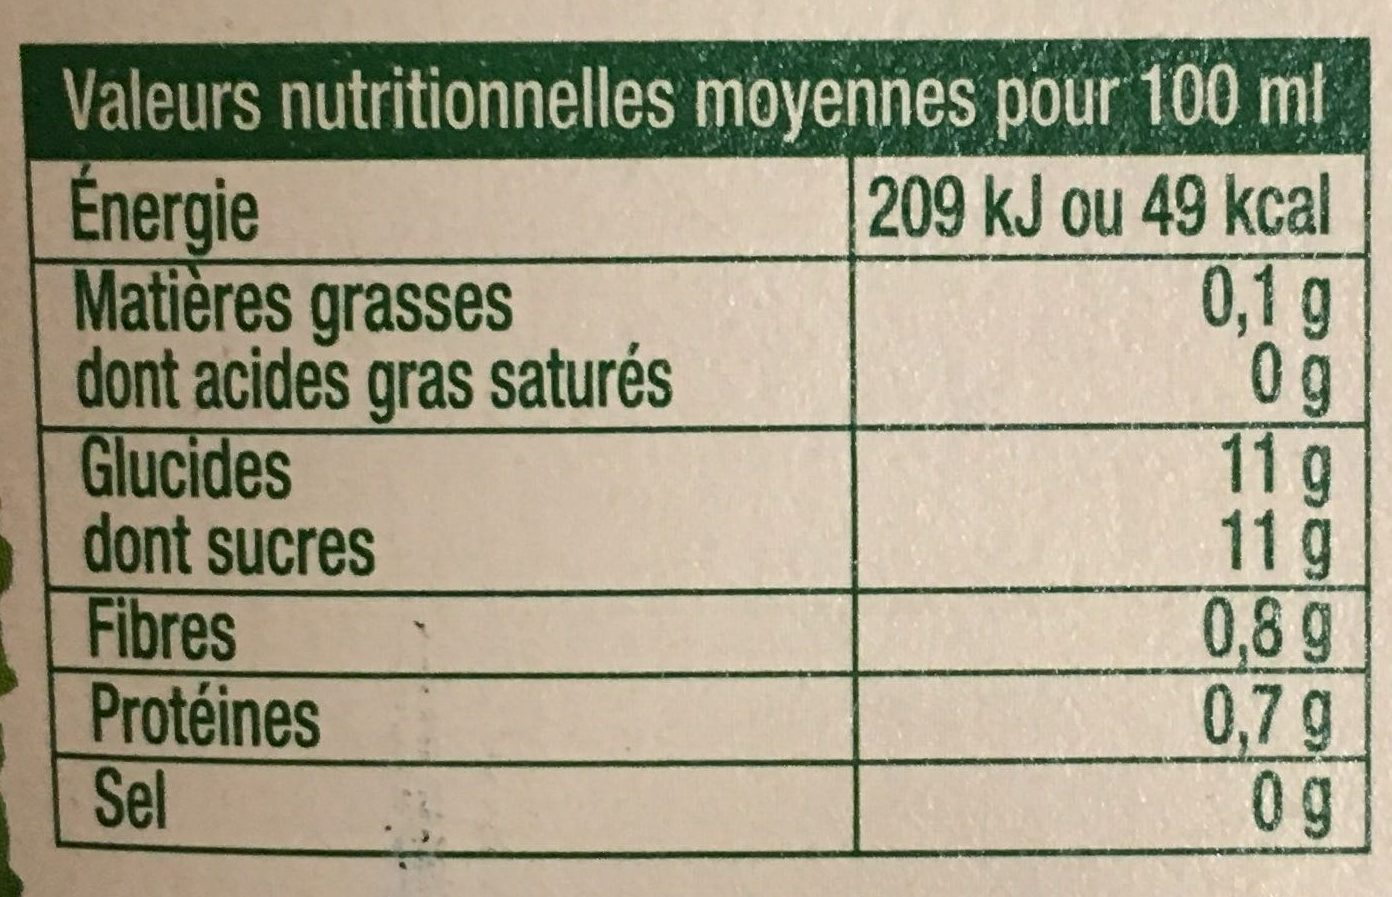 Oranges pressées (offre éco) - Voedingswaarden